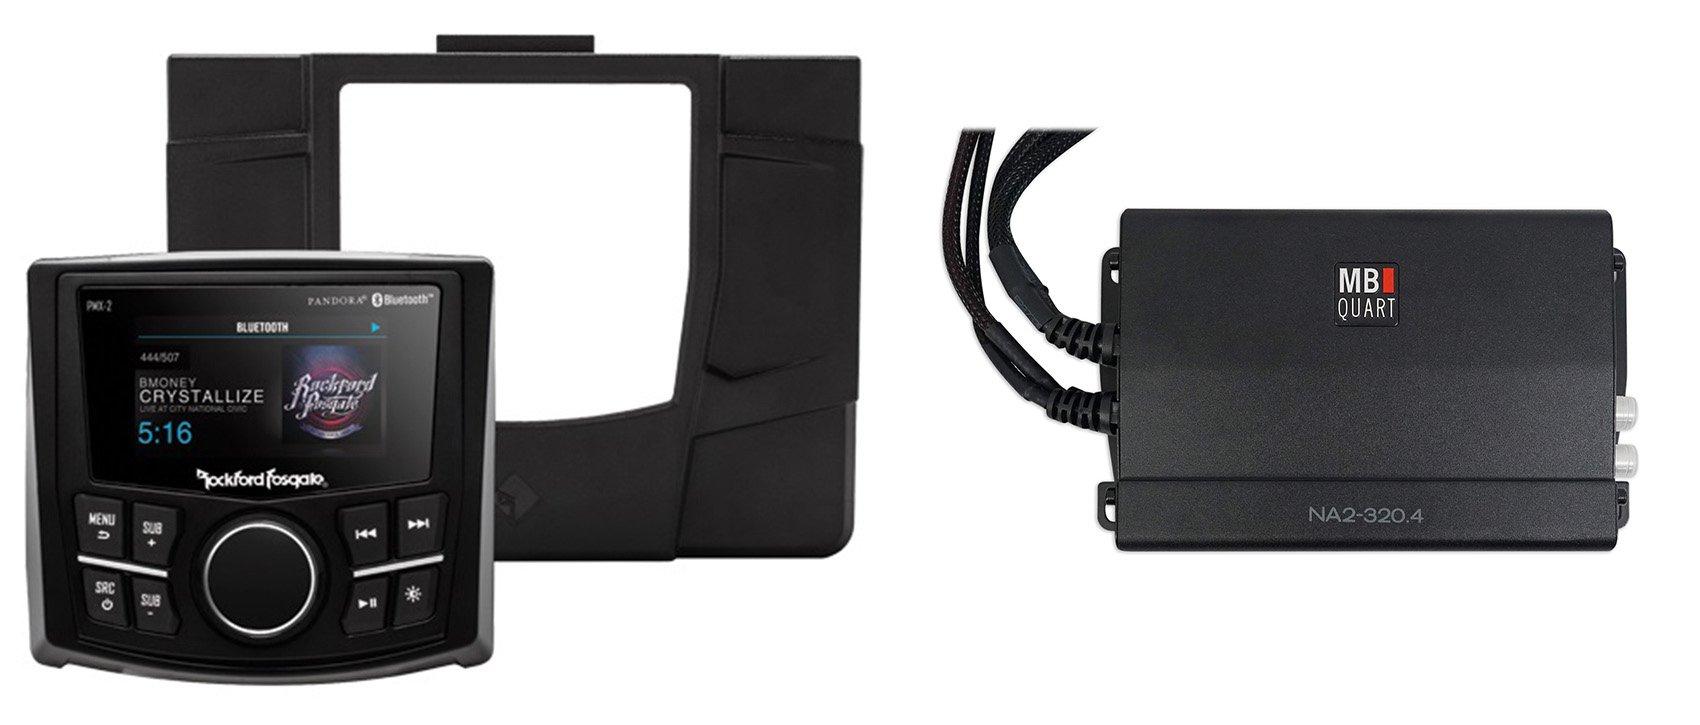 Rockford Fosgate Polaris RZR-STAGE1 Digital Media Receiver+Dash Kit+Free Amp by Rockford Fosgate